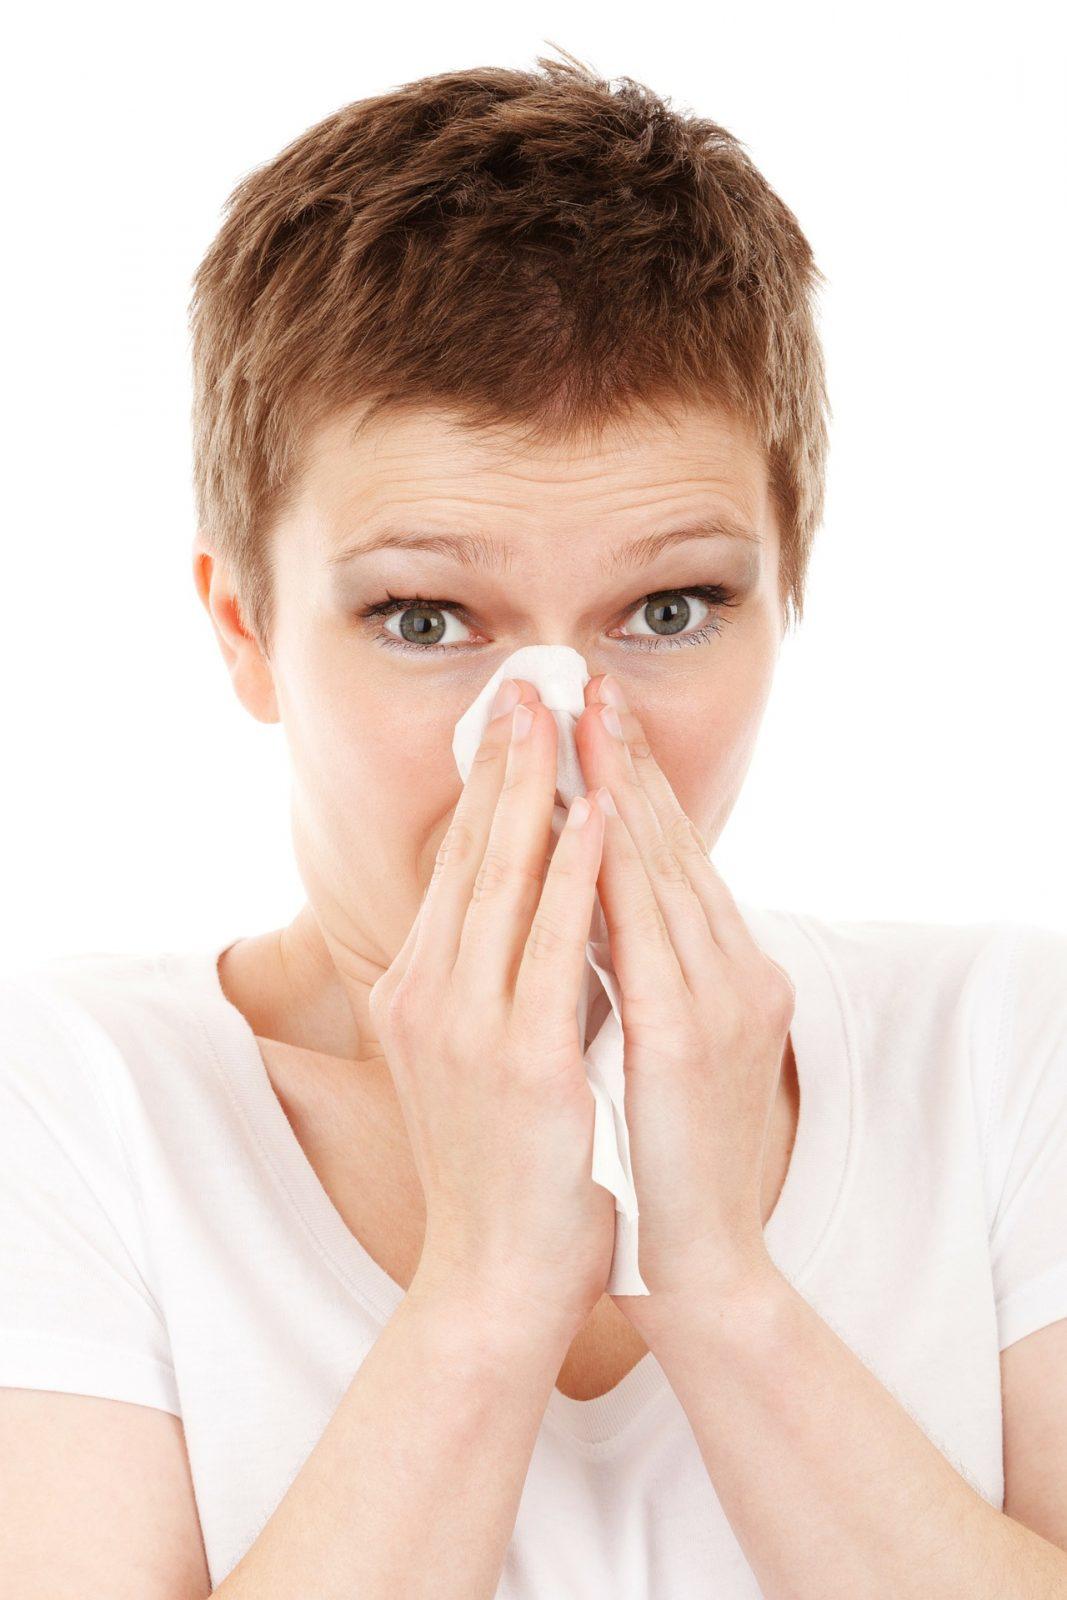 rinite alérgica, remédio para rinite alérgica, sintomas da rinite alérgica, o que é rinite alérgica.